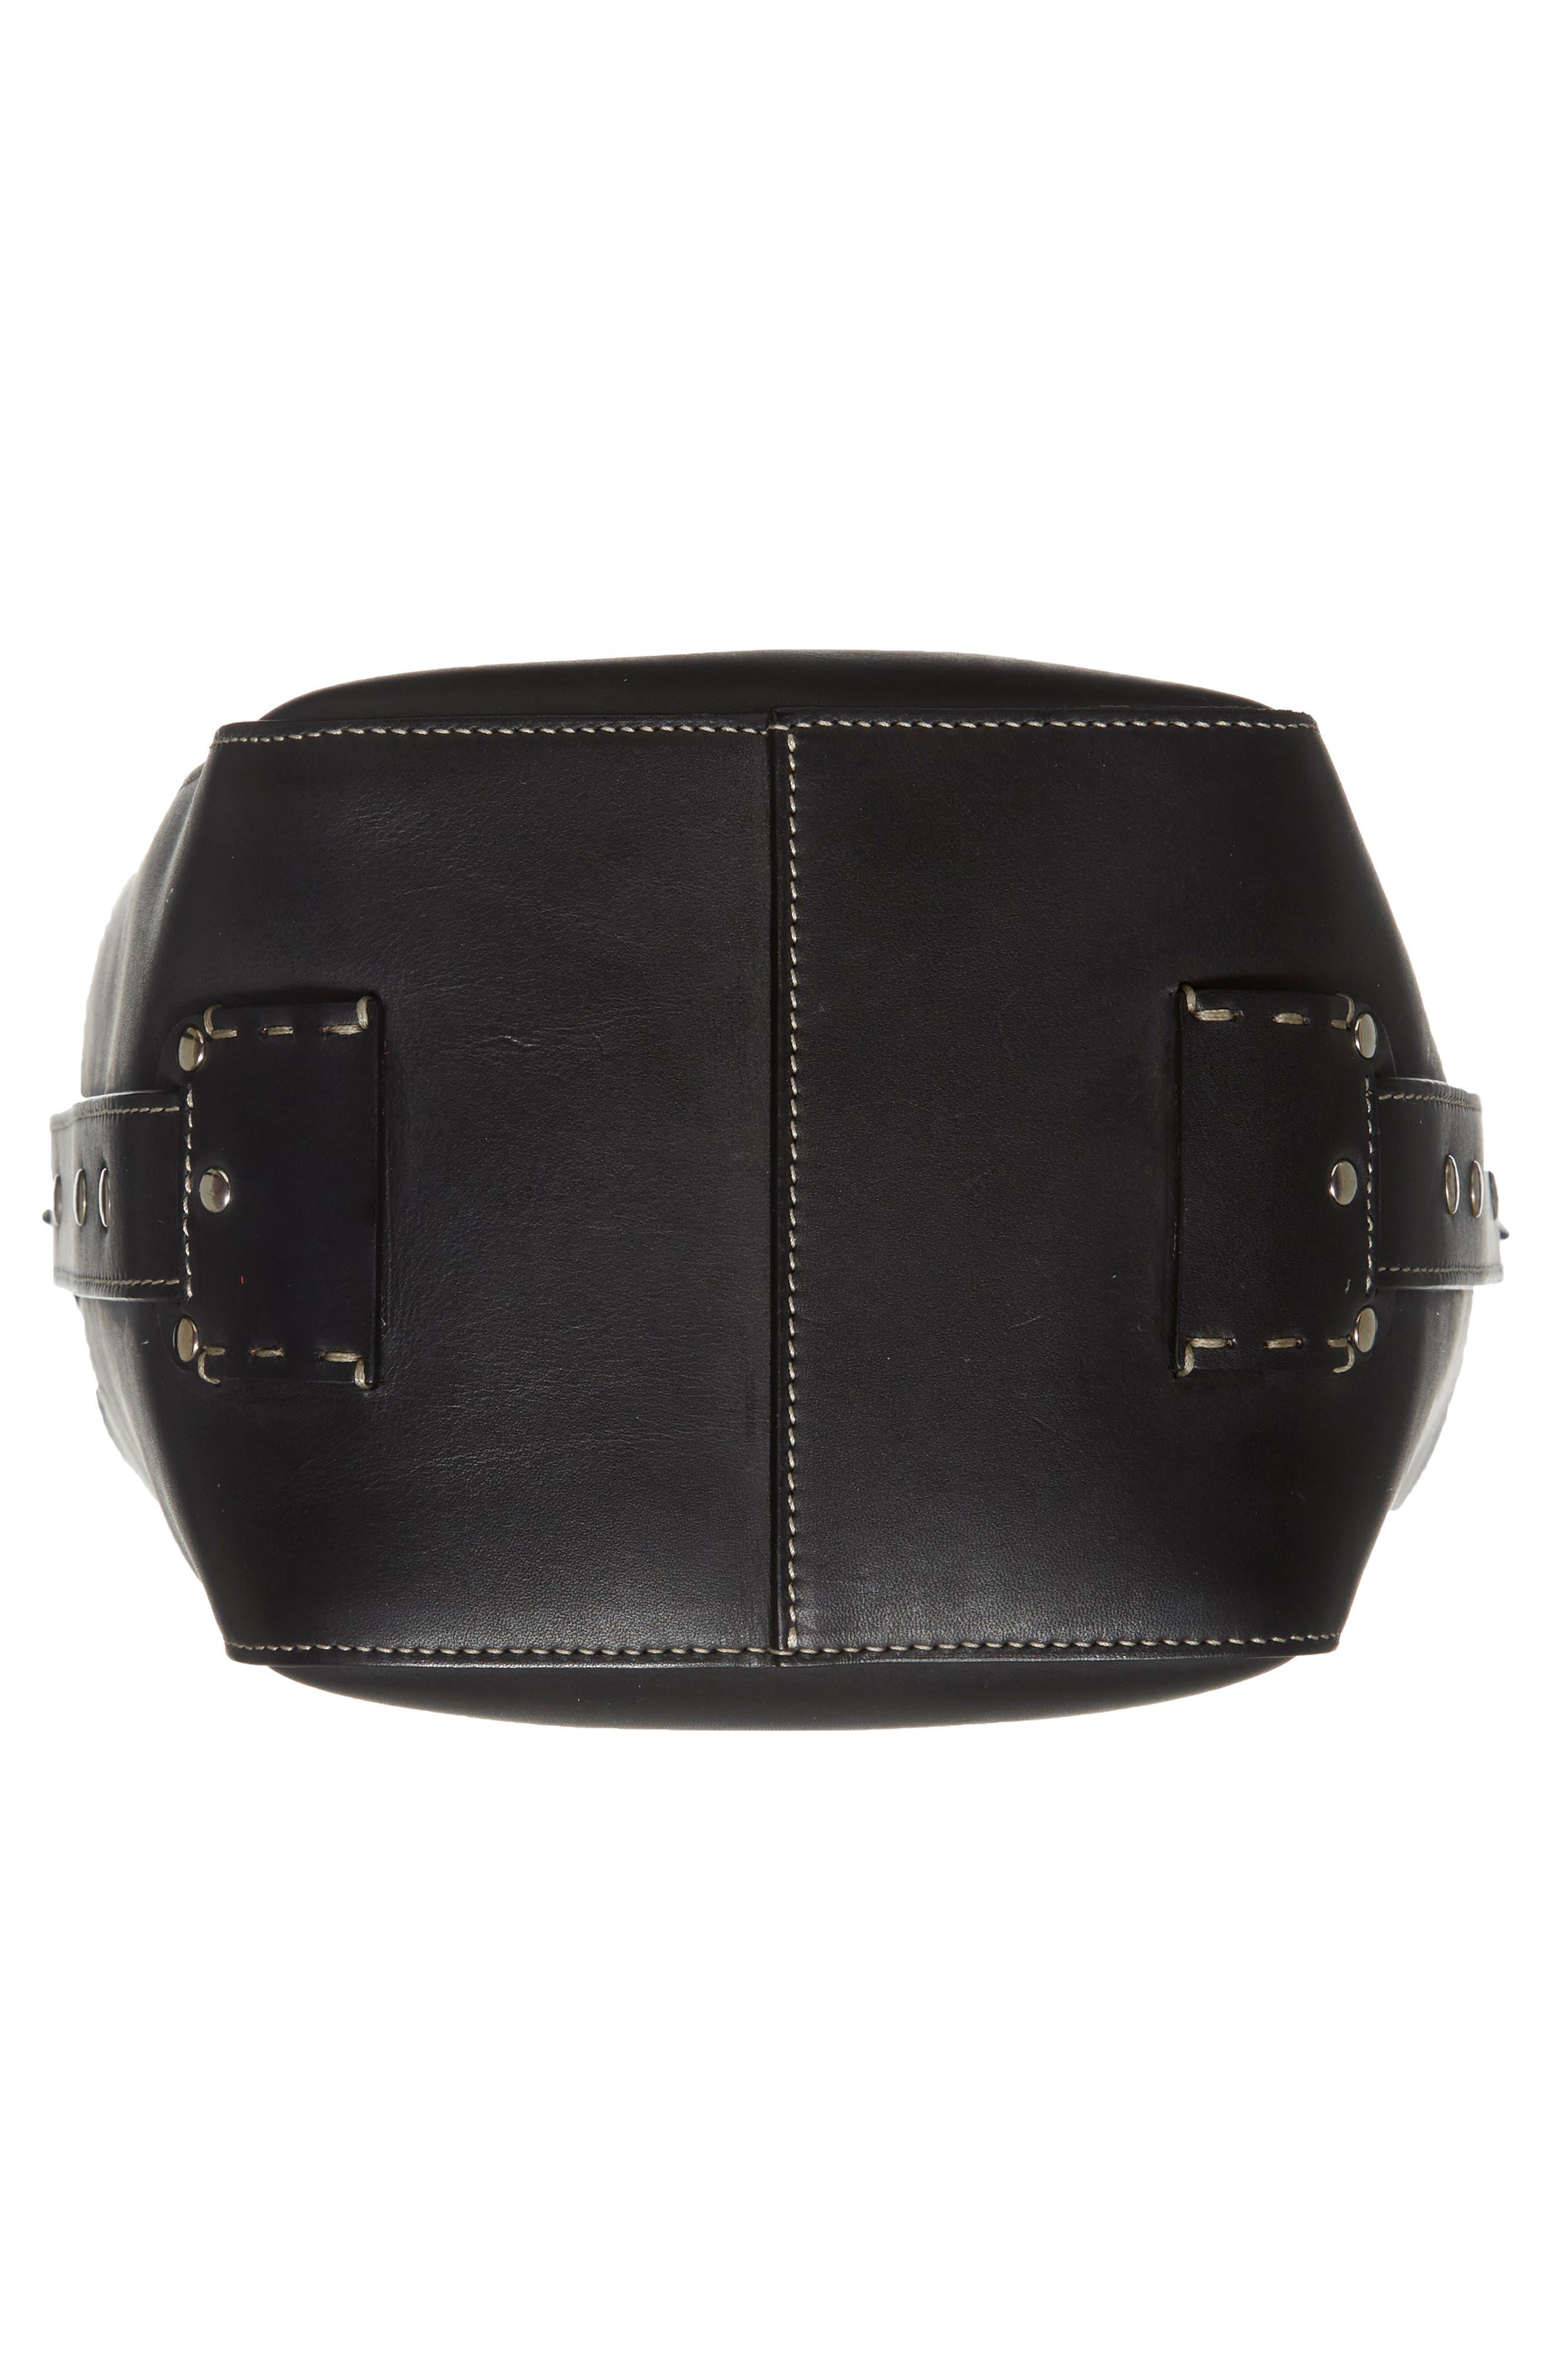 GHURKA,                             Starlet Leather Bucket Bag,                             Alternate thumbnail 6, color,                             001